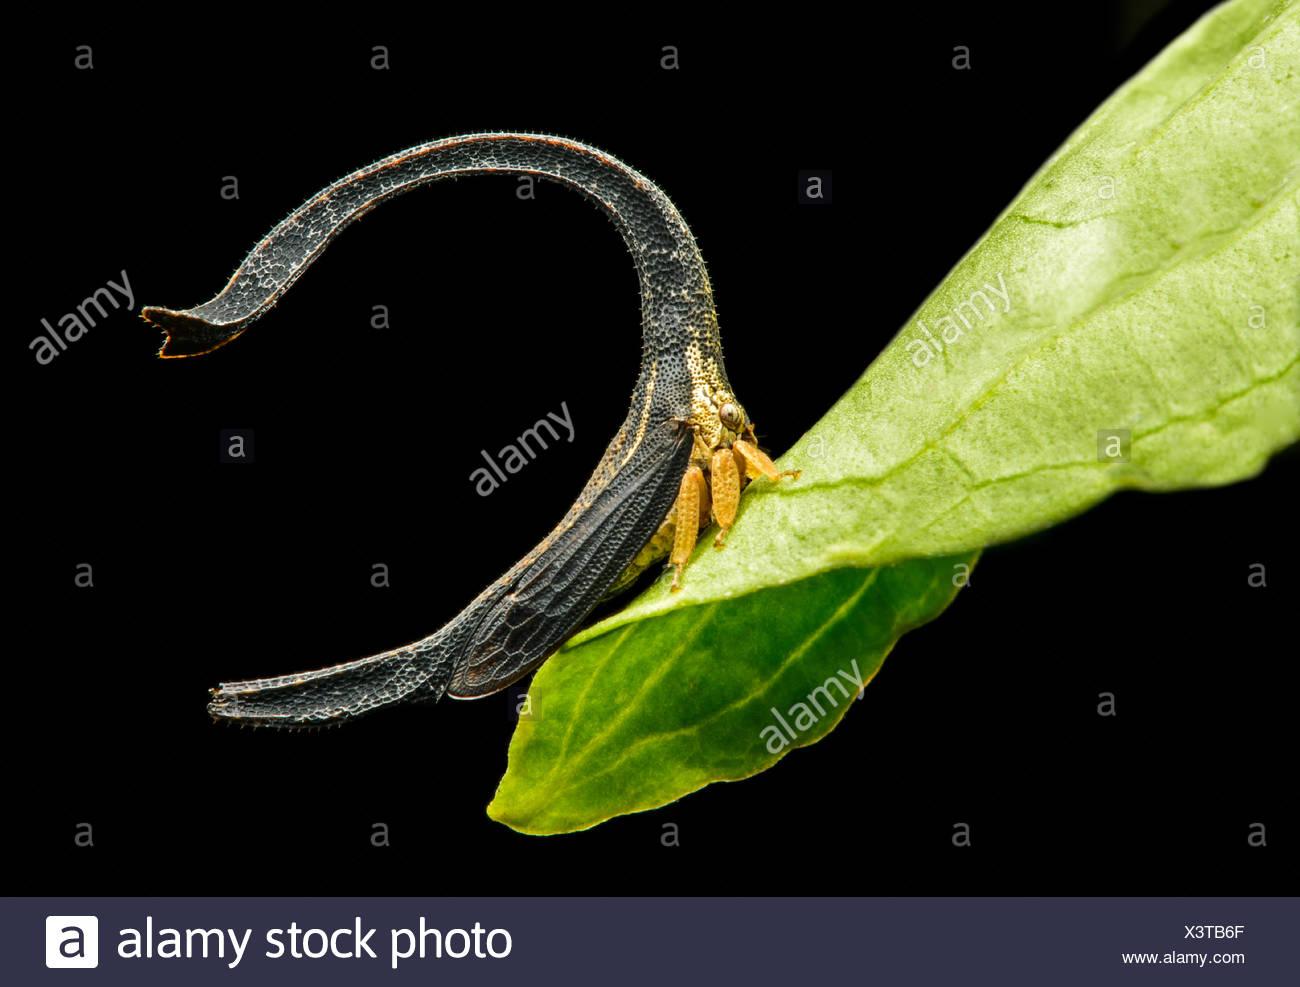 Treehopper (Cladonota sp.), size 4mm, Andean cloud forest, Mindo, Ecuador Stock Photo